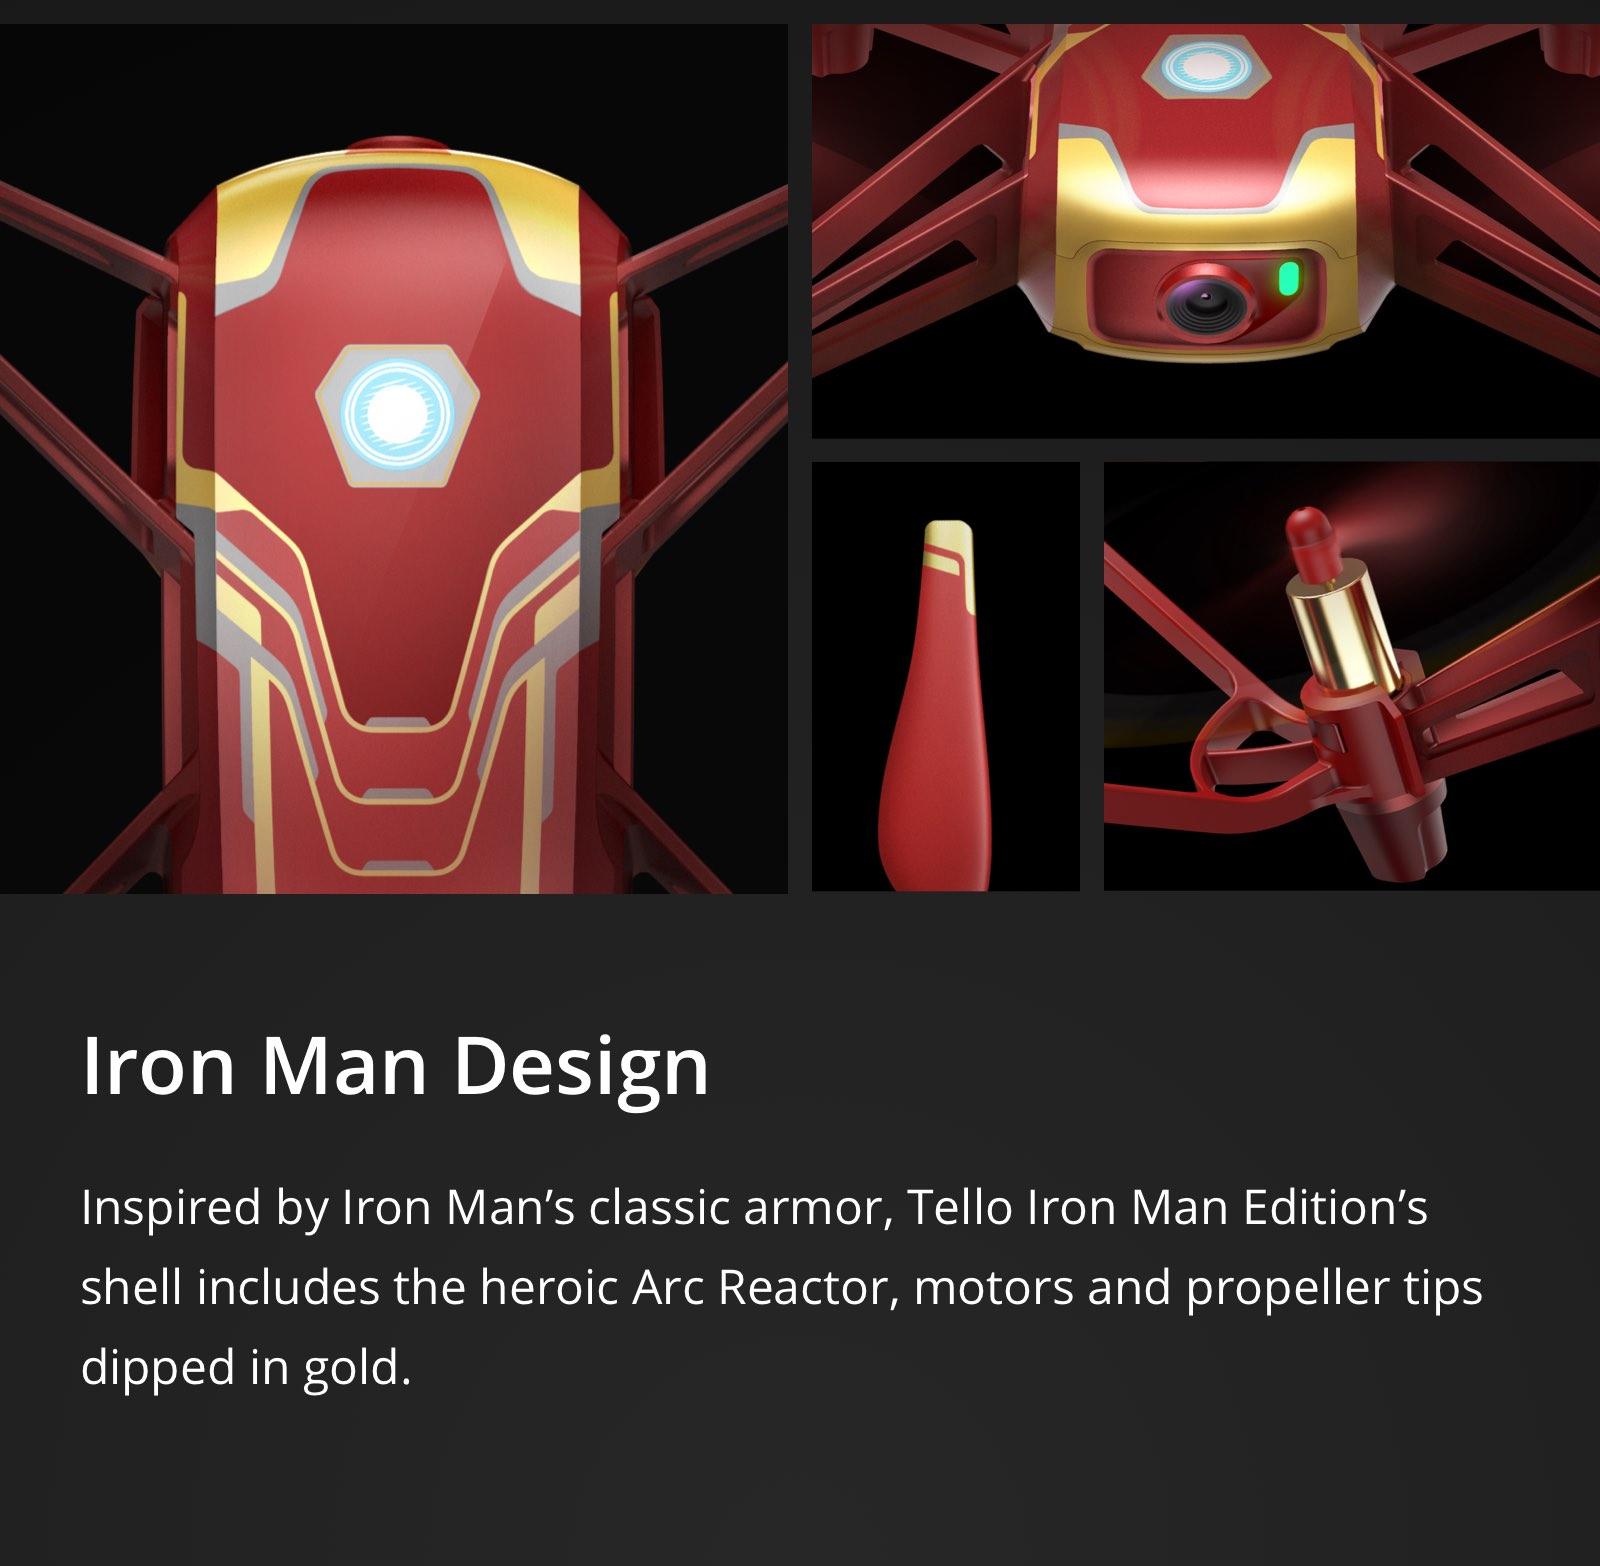 DJI Tello Iron Man Edition 720p Video Recording Drone Traditional Video  Camera by Ryze - Newegg com